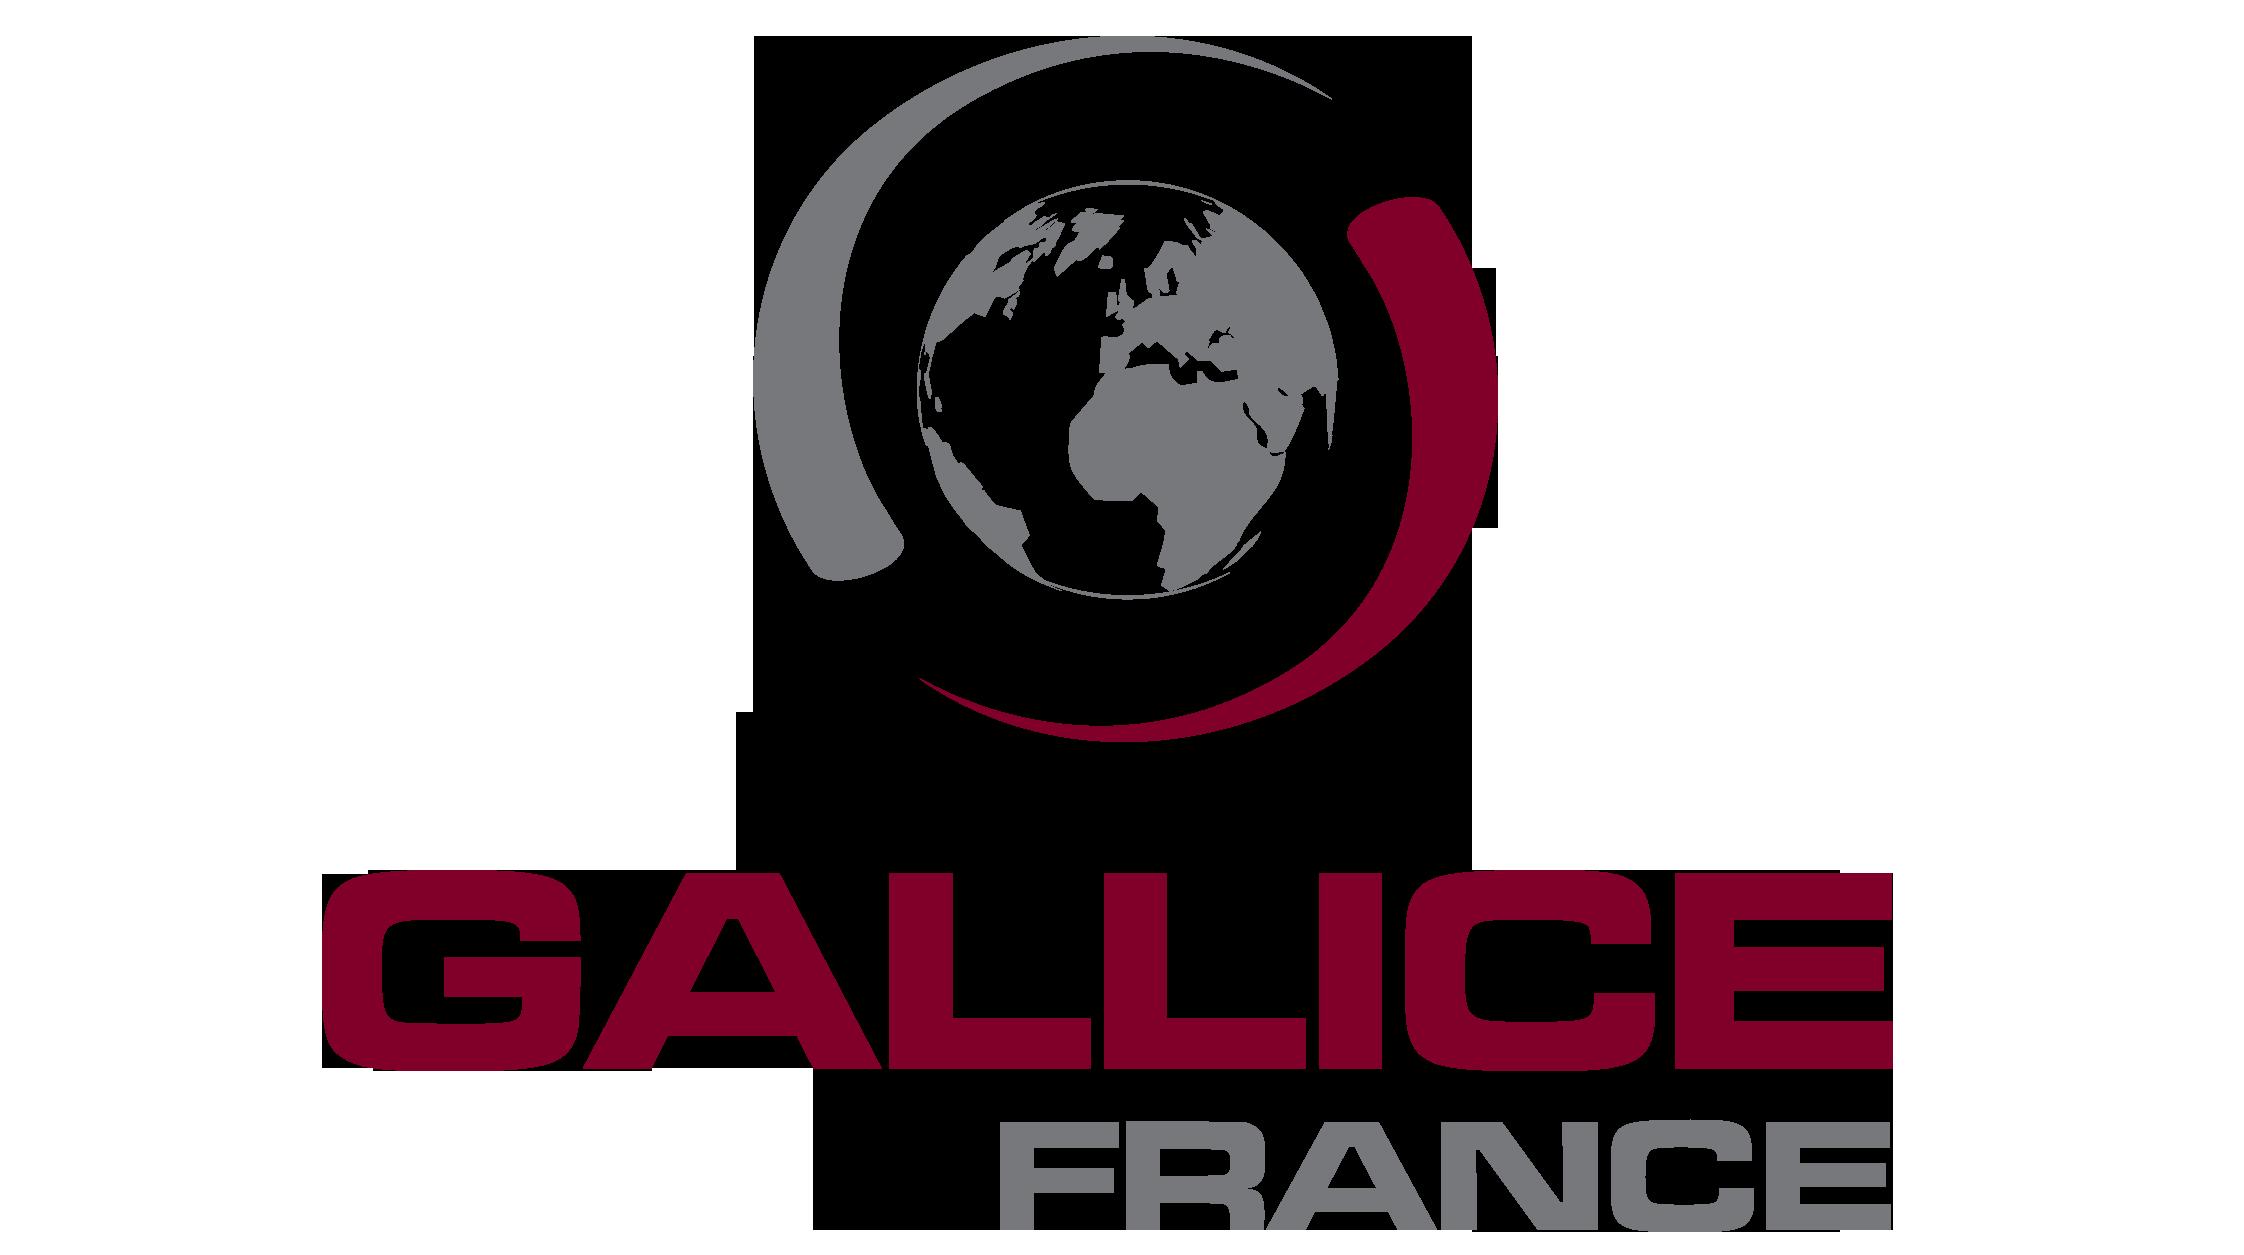 Gallice France